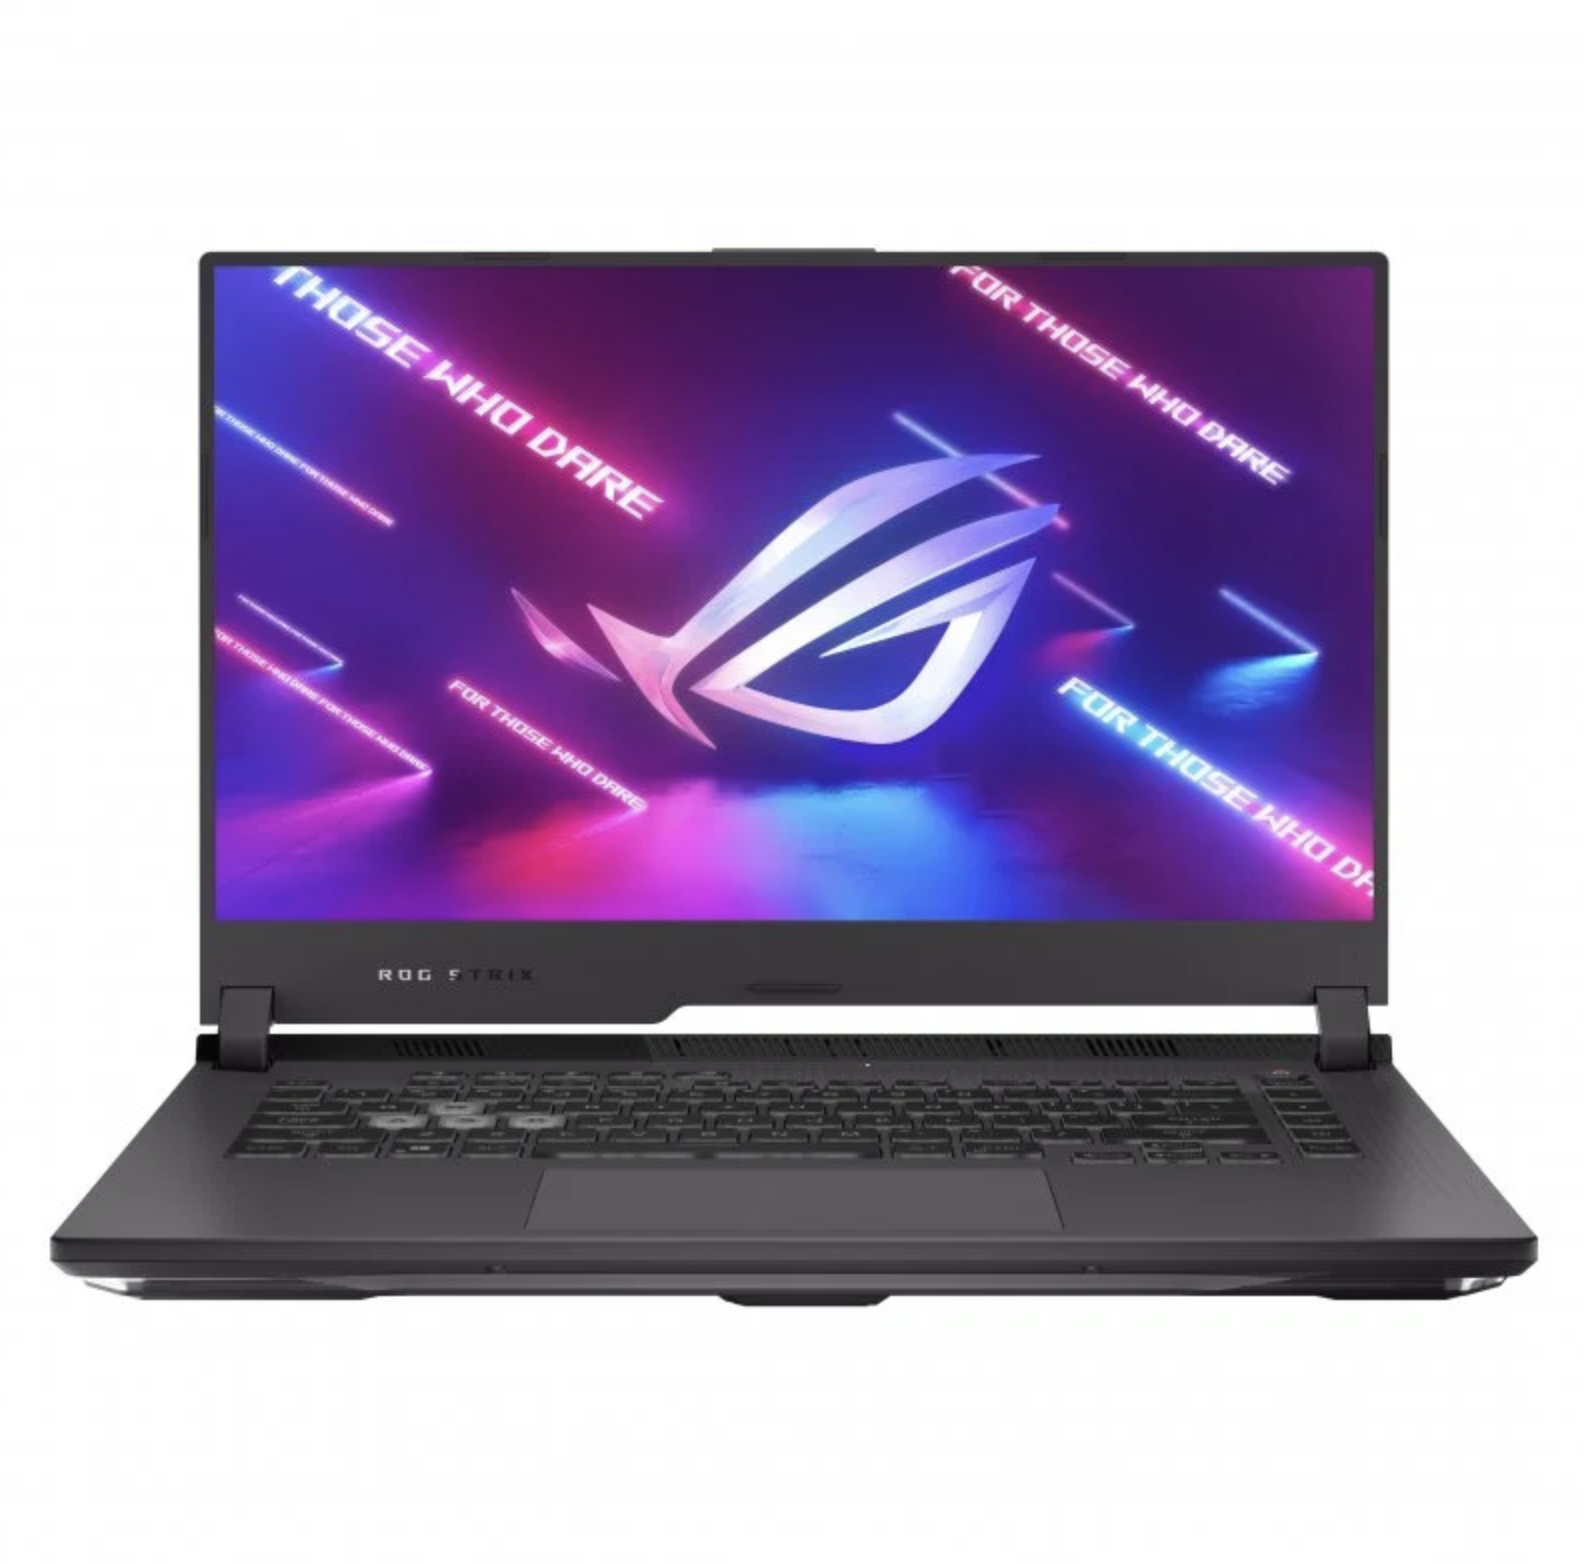 ASUS Rog Strix G513IH HN008 AMD Ryzen 7 4800H 16GB 512GB SSD GTX 1650 156